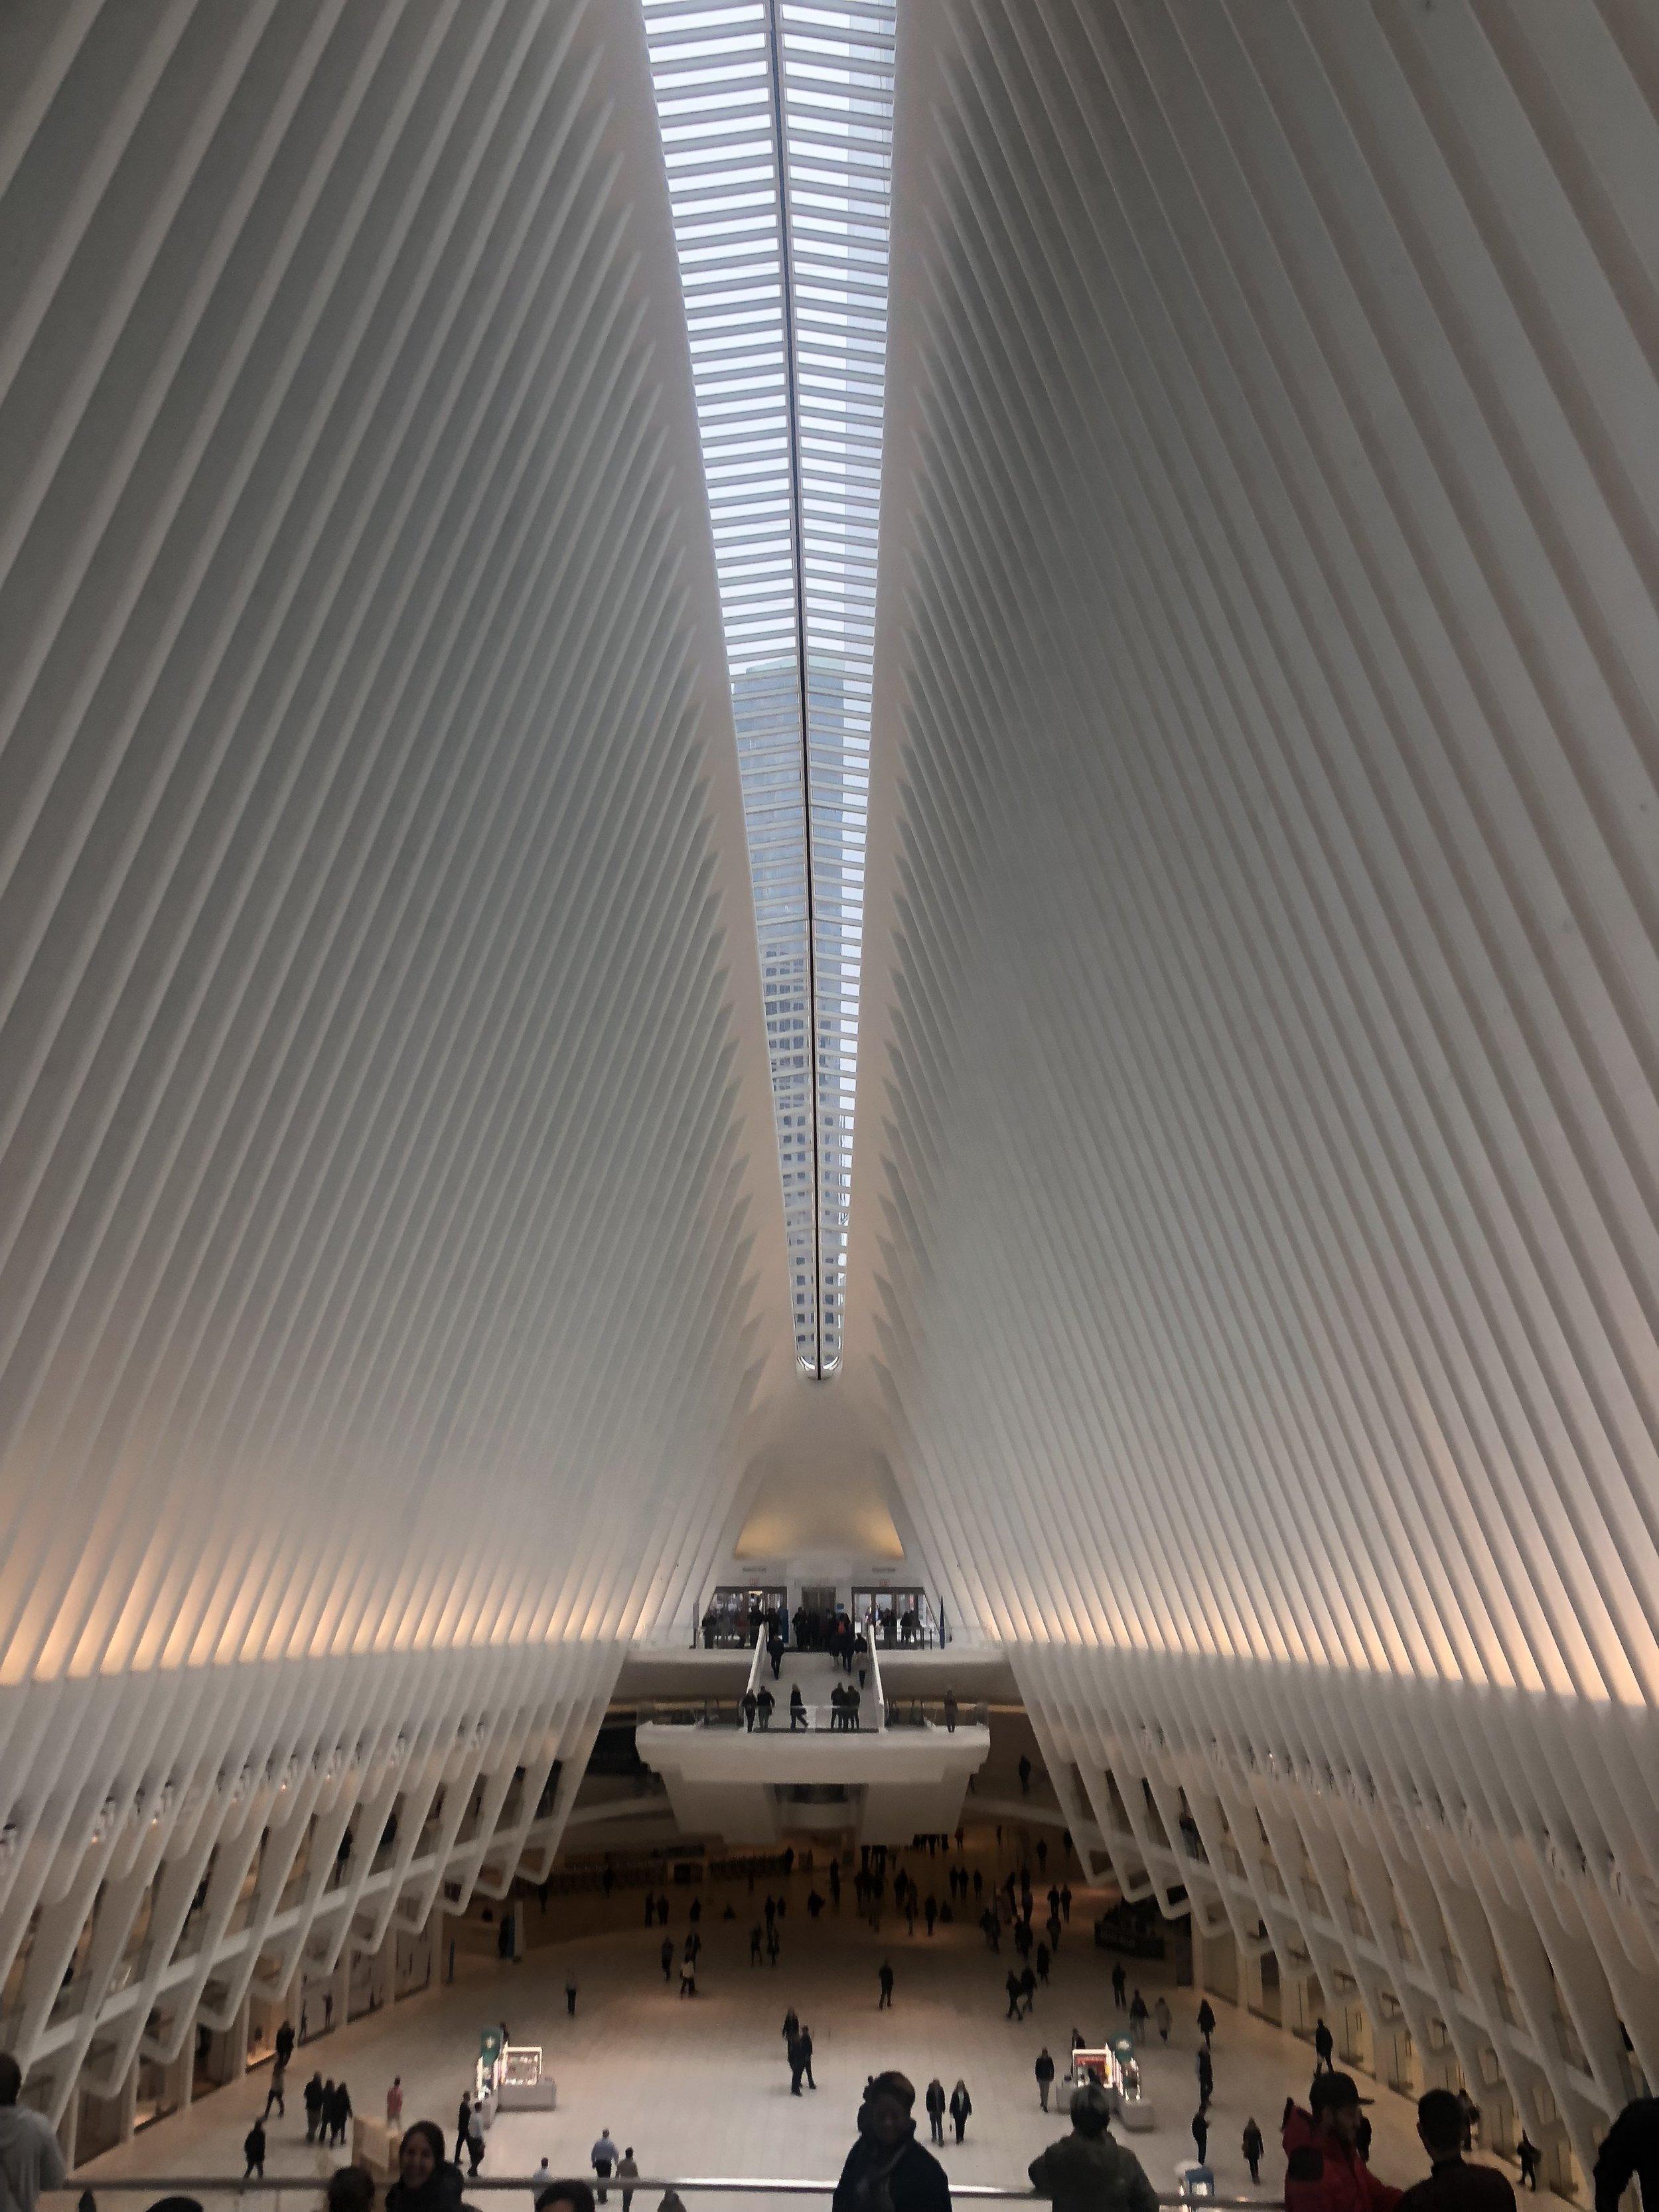 Inside the Oculus